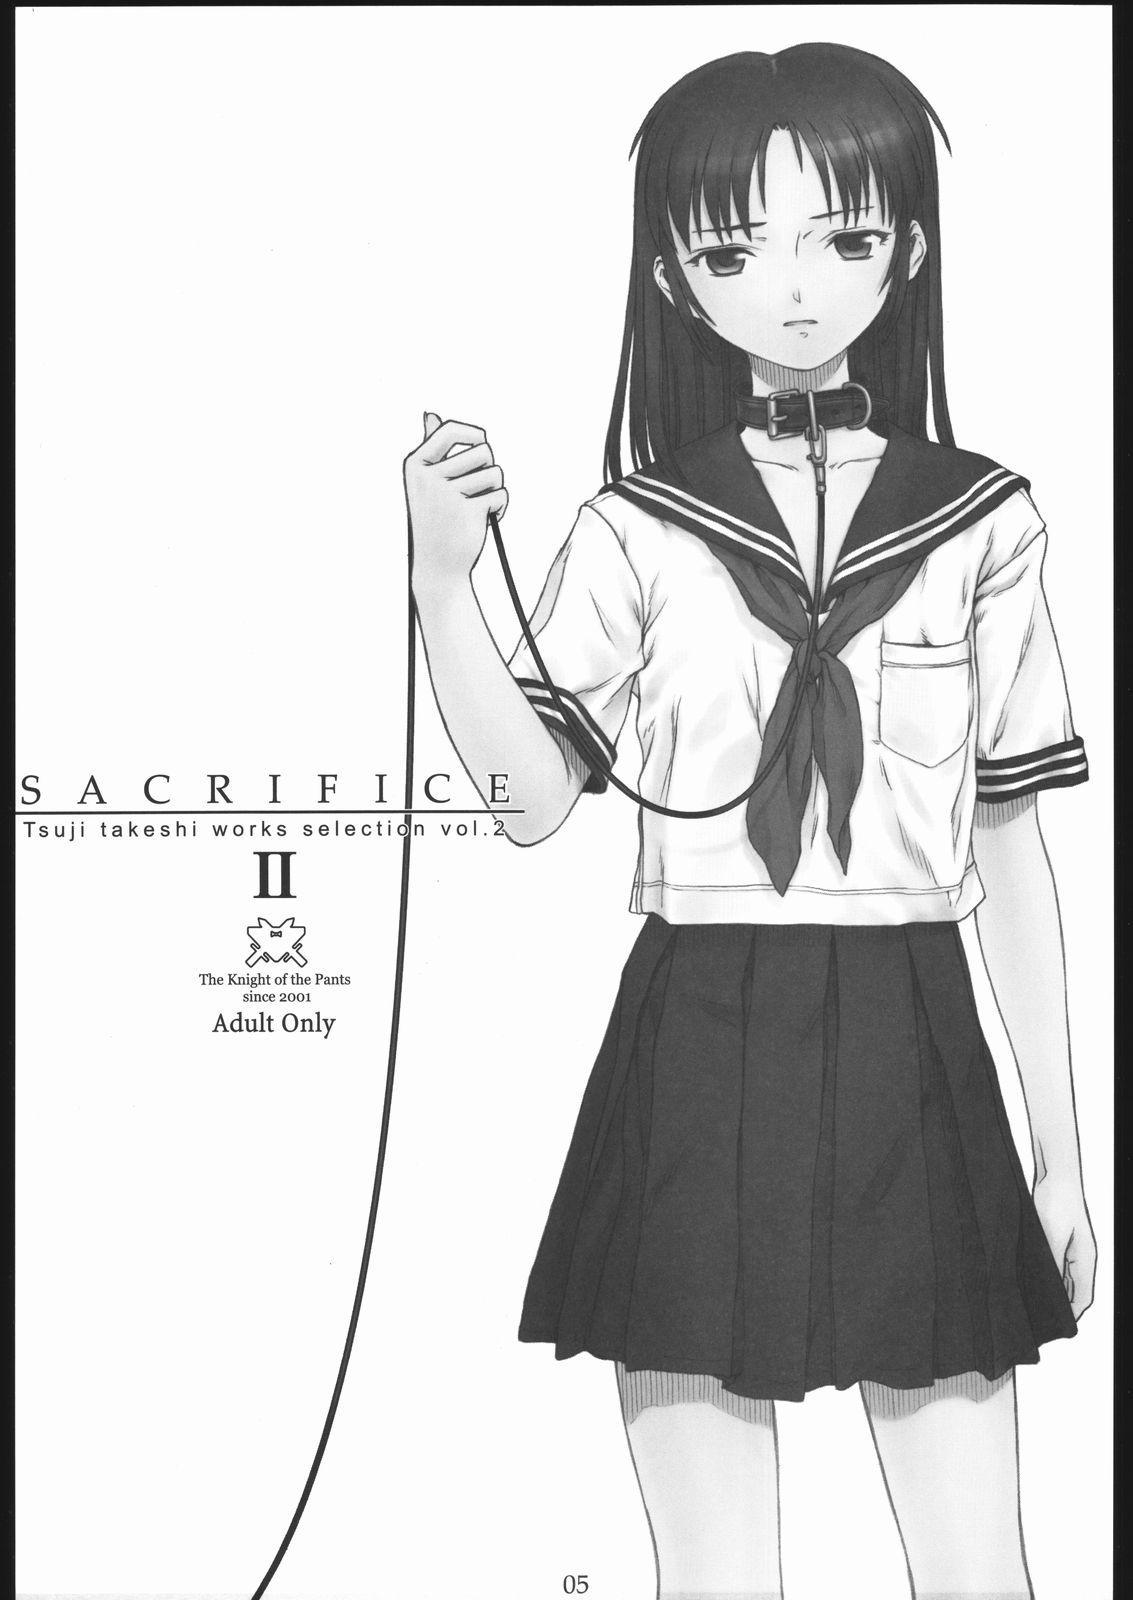 SACRIFICE Tsuji Takeshi Works Selection vol. 2 2